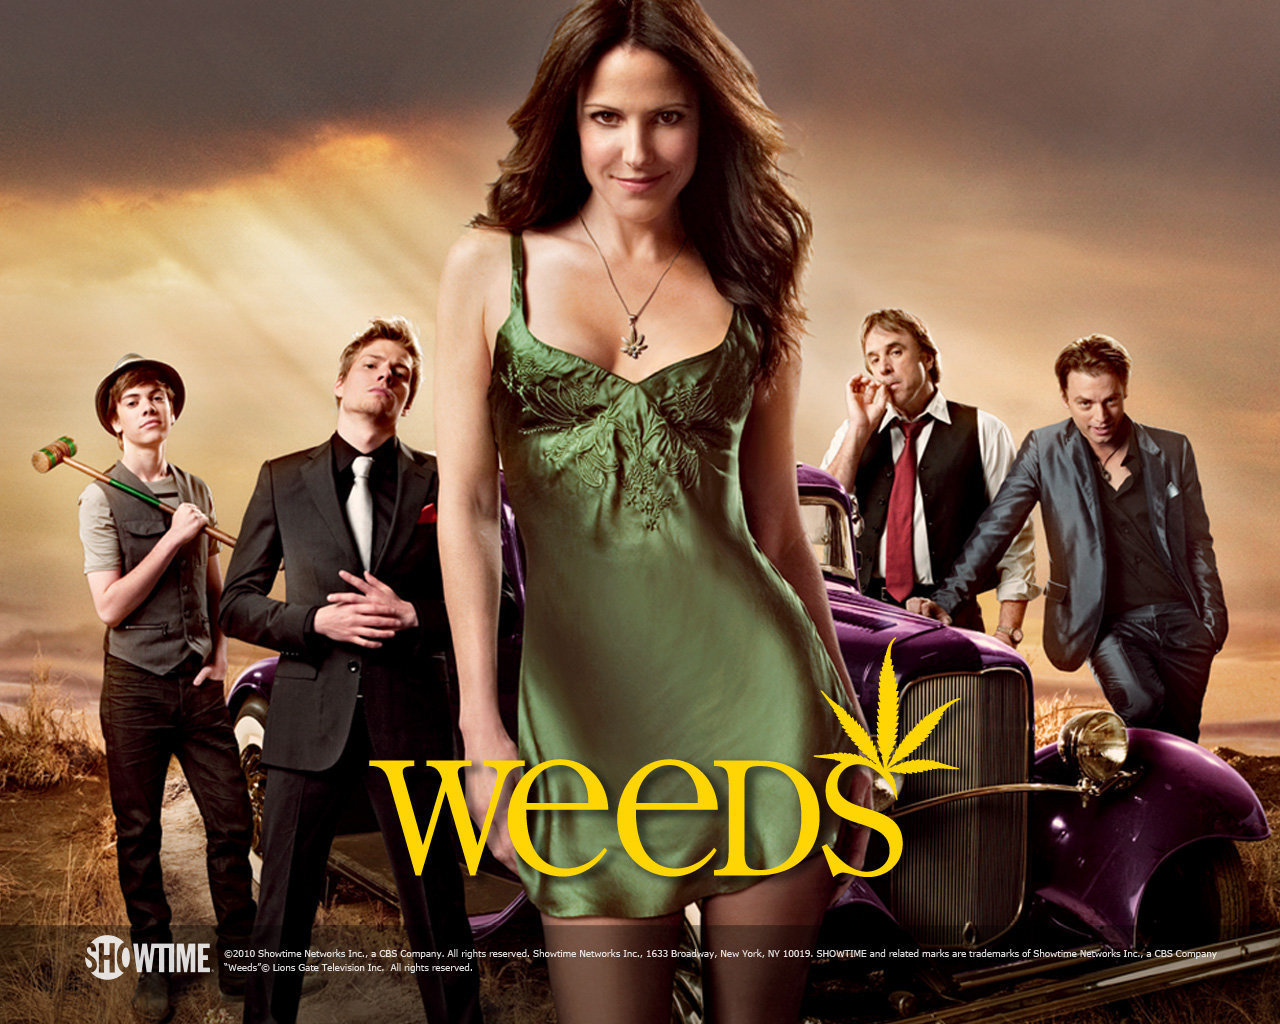 Weeds-weeds-17110052-1280-1024.jpg